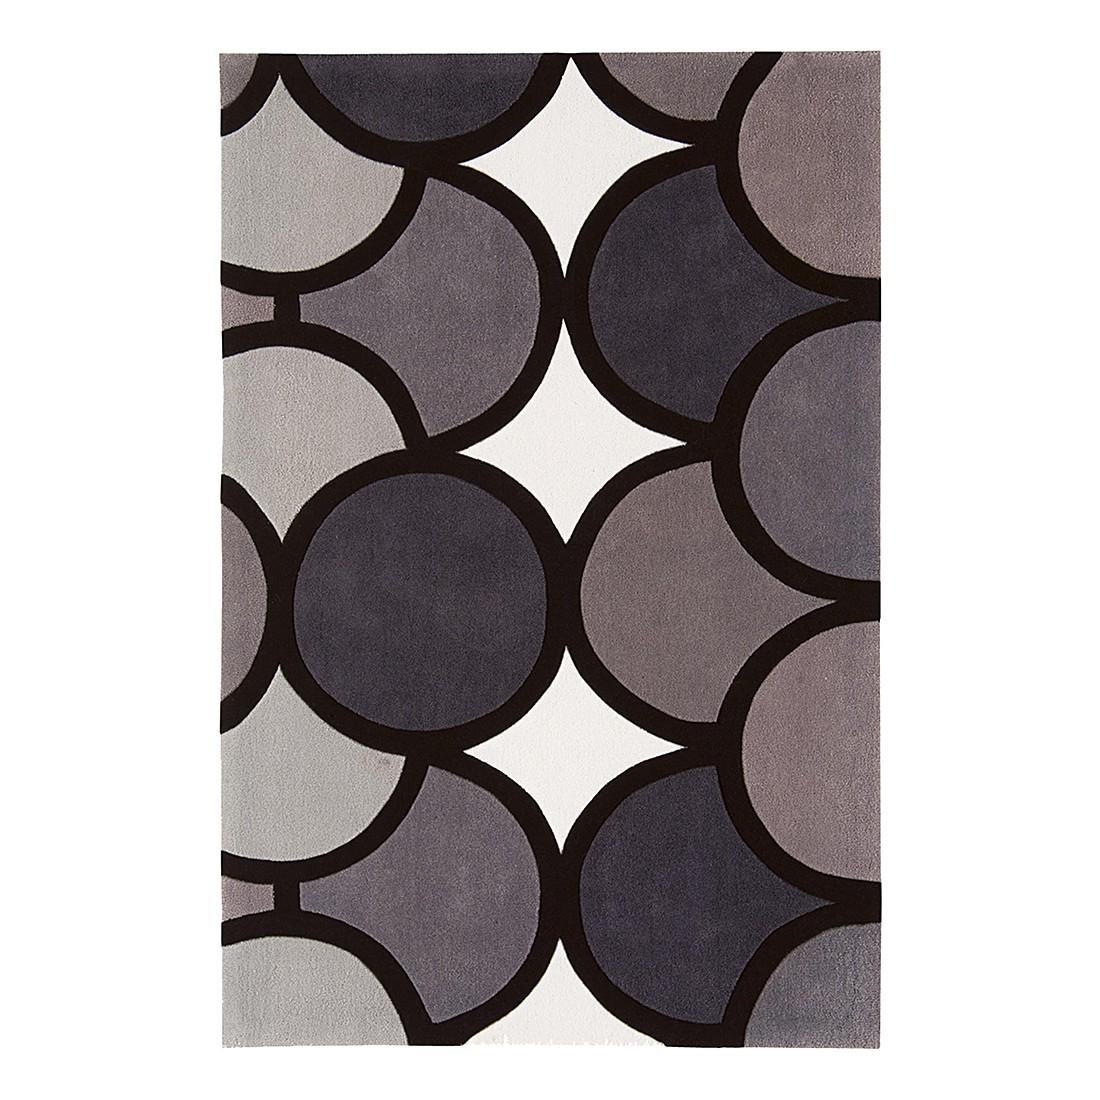 Teppich Harlequin Bubble – Grau – 160 x 230 cm, benuta günstig